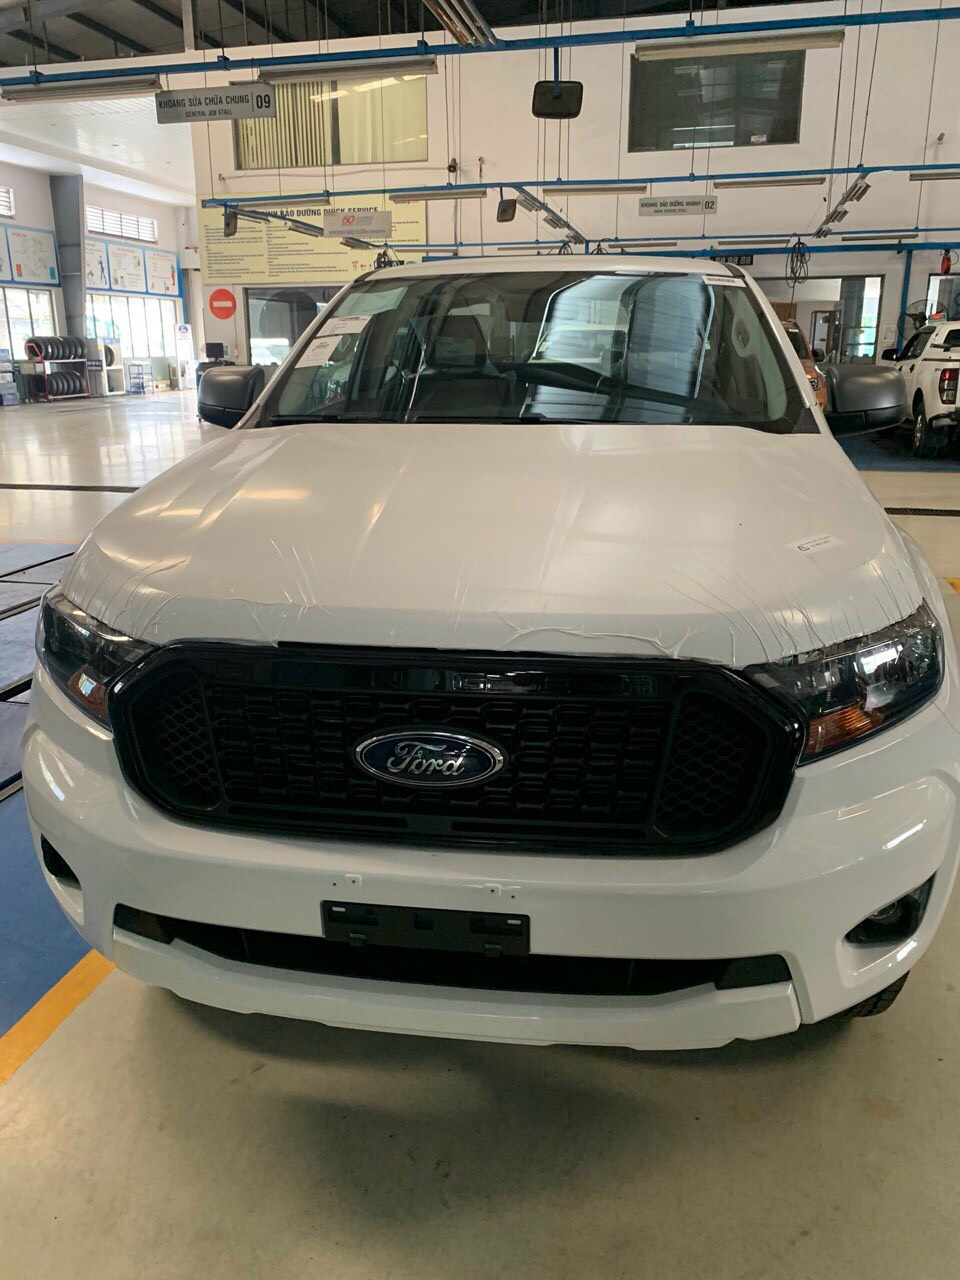 Ford Ranger XLS 2.2L 4×2 AT5